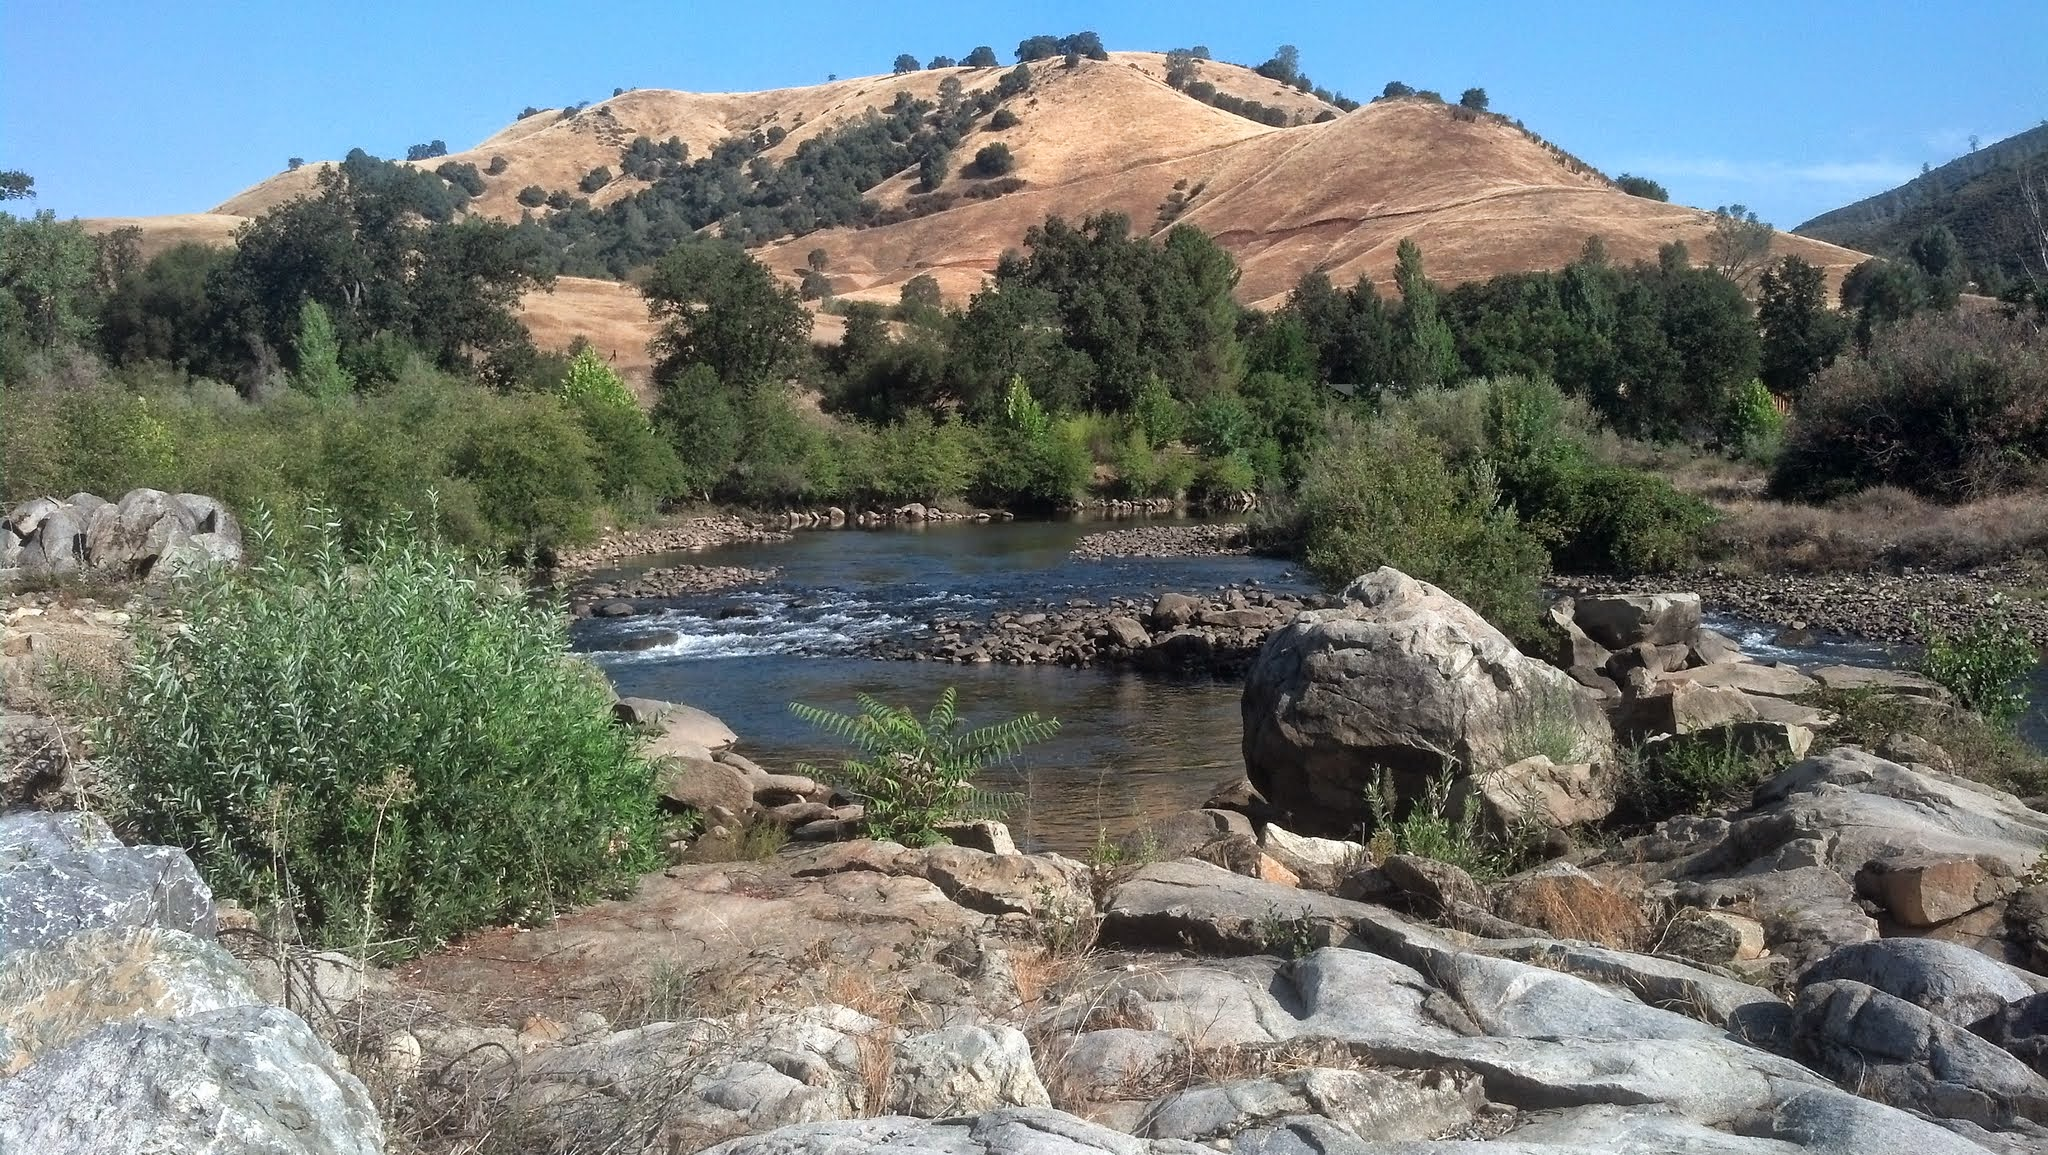 Campground review ponderosa thousand trails lotus ca for Ponderosa cabins california